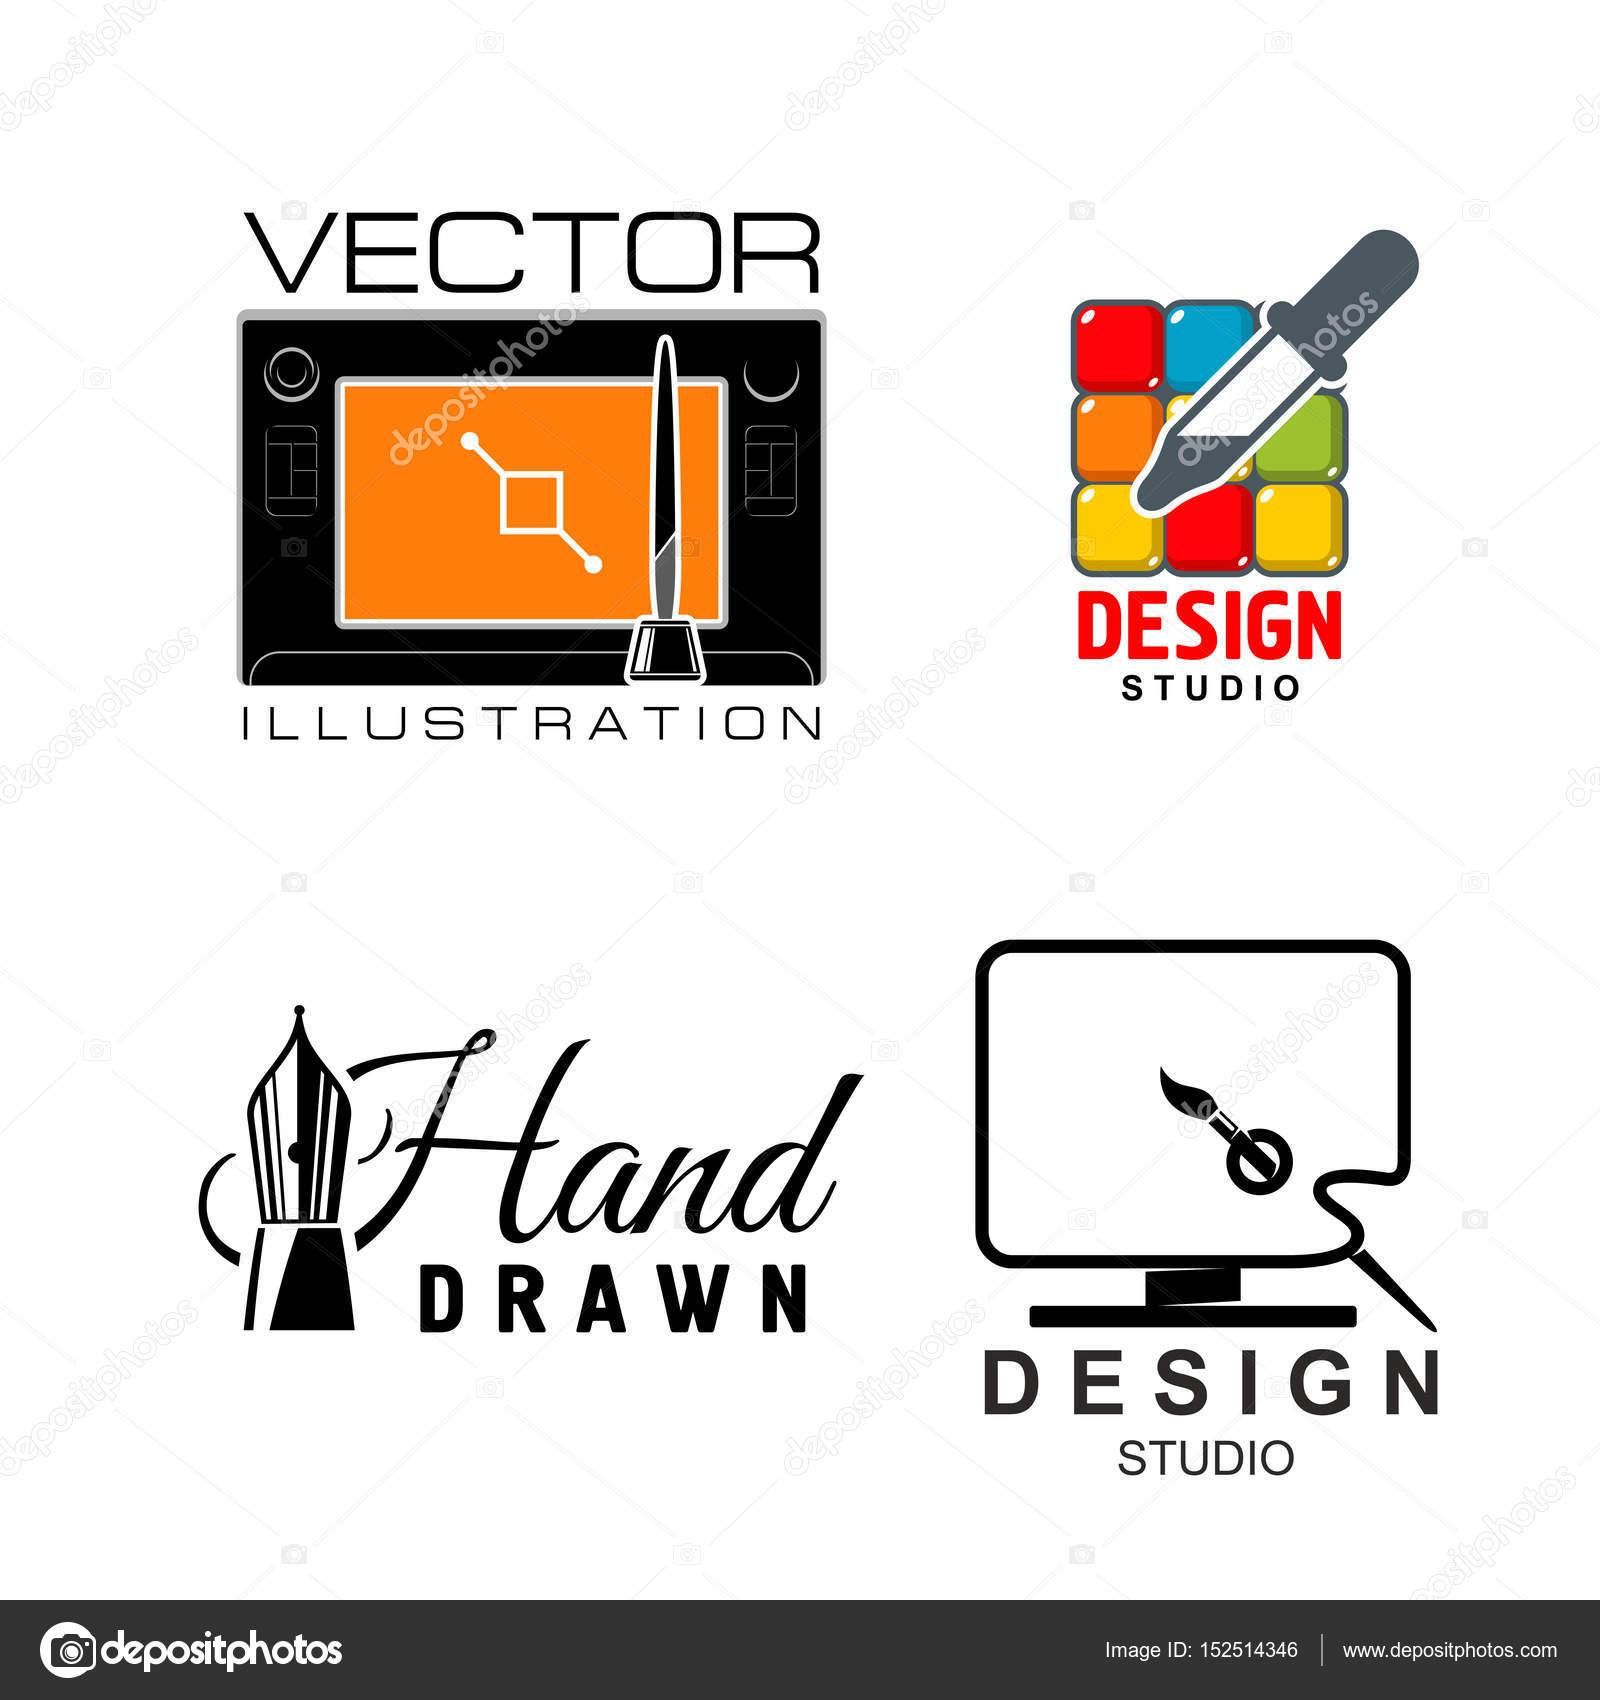 Grafik Design Studio | Vektor Icons Fur Grafik Design Oder Design Studio Stockvektor